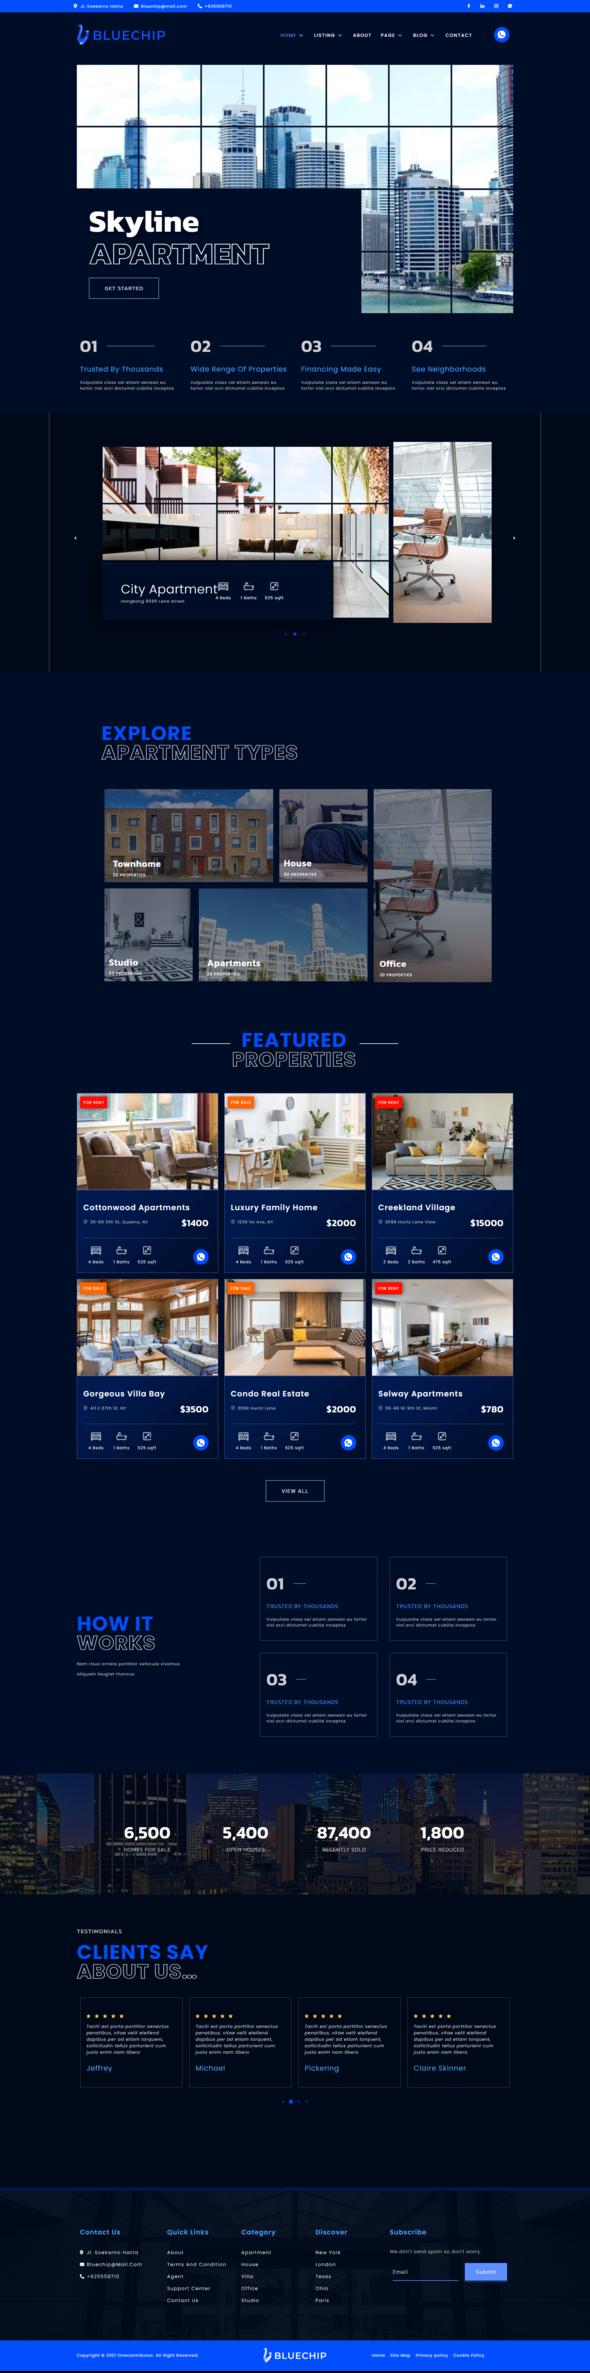 Bluechip - Apartment amp Property Elementor Template Kit TFx